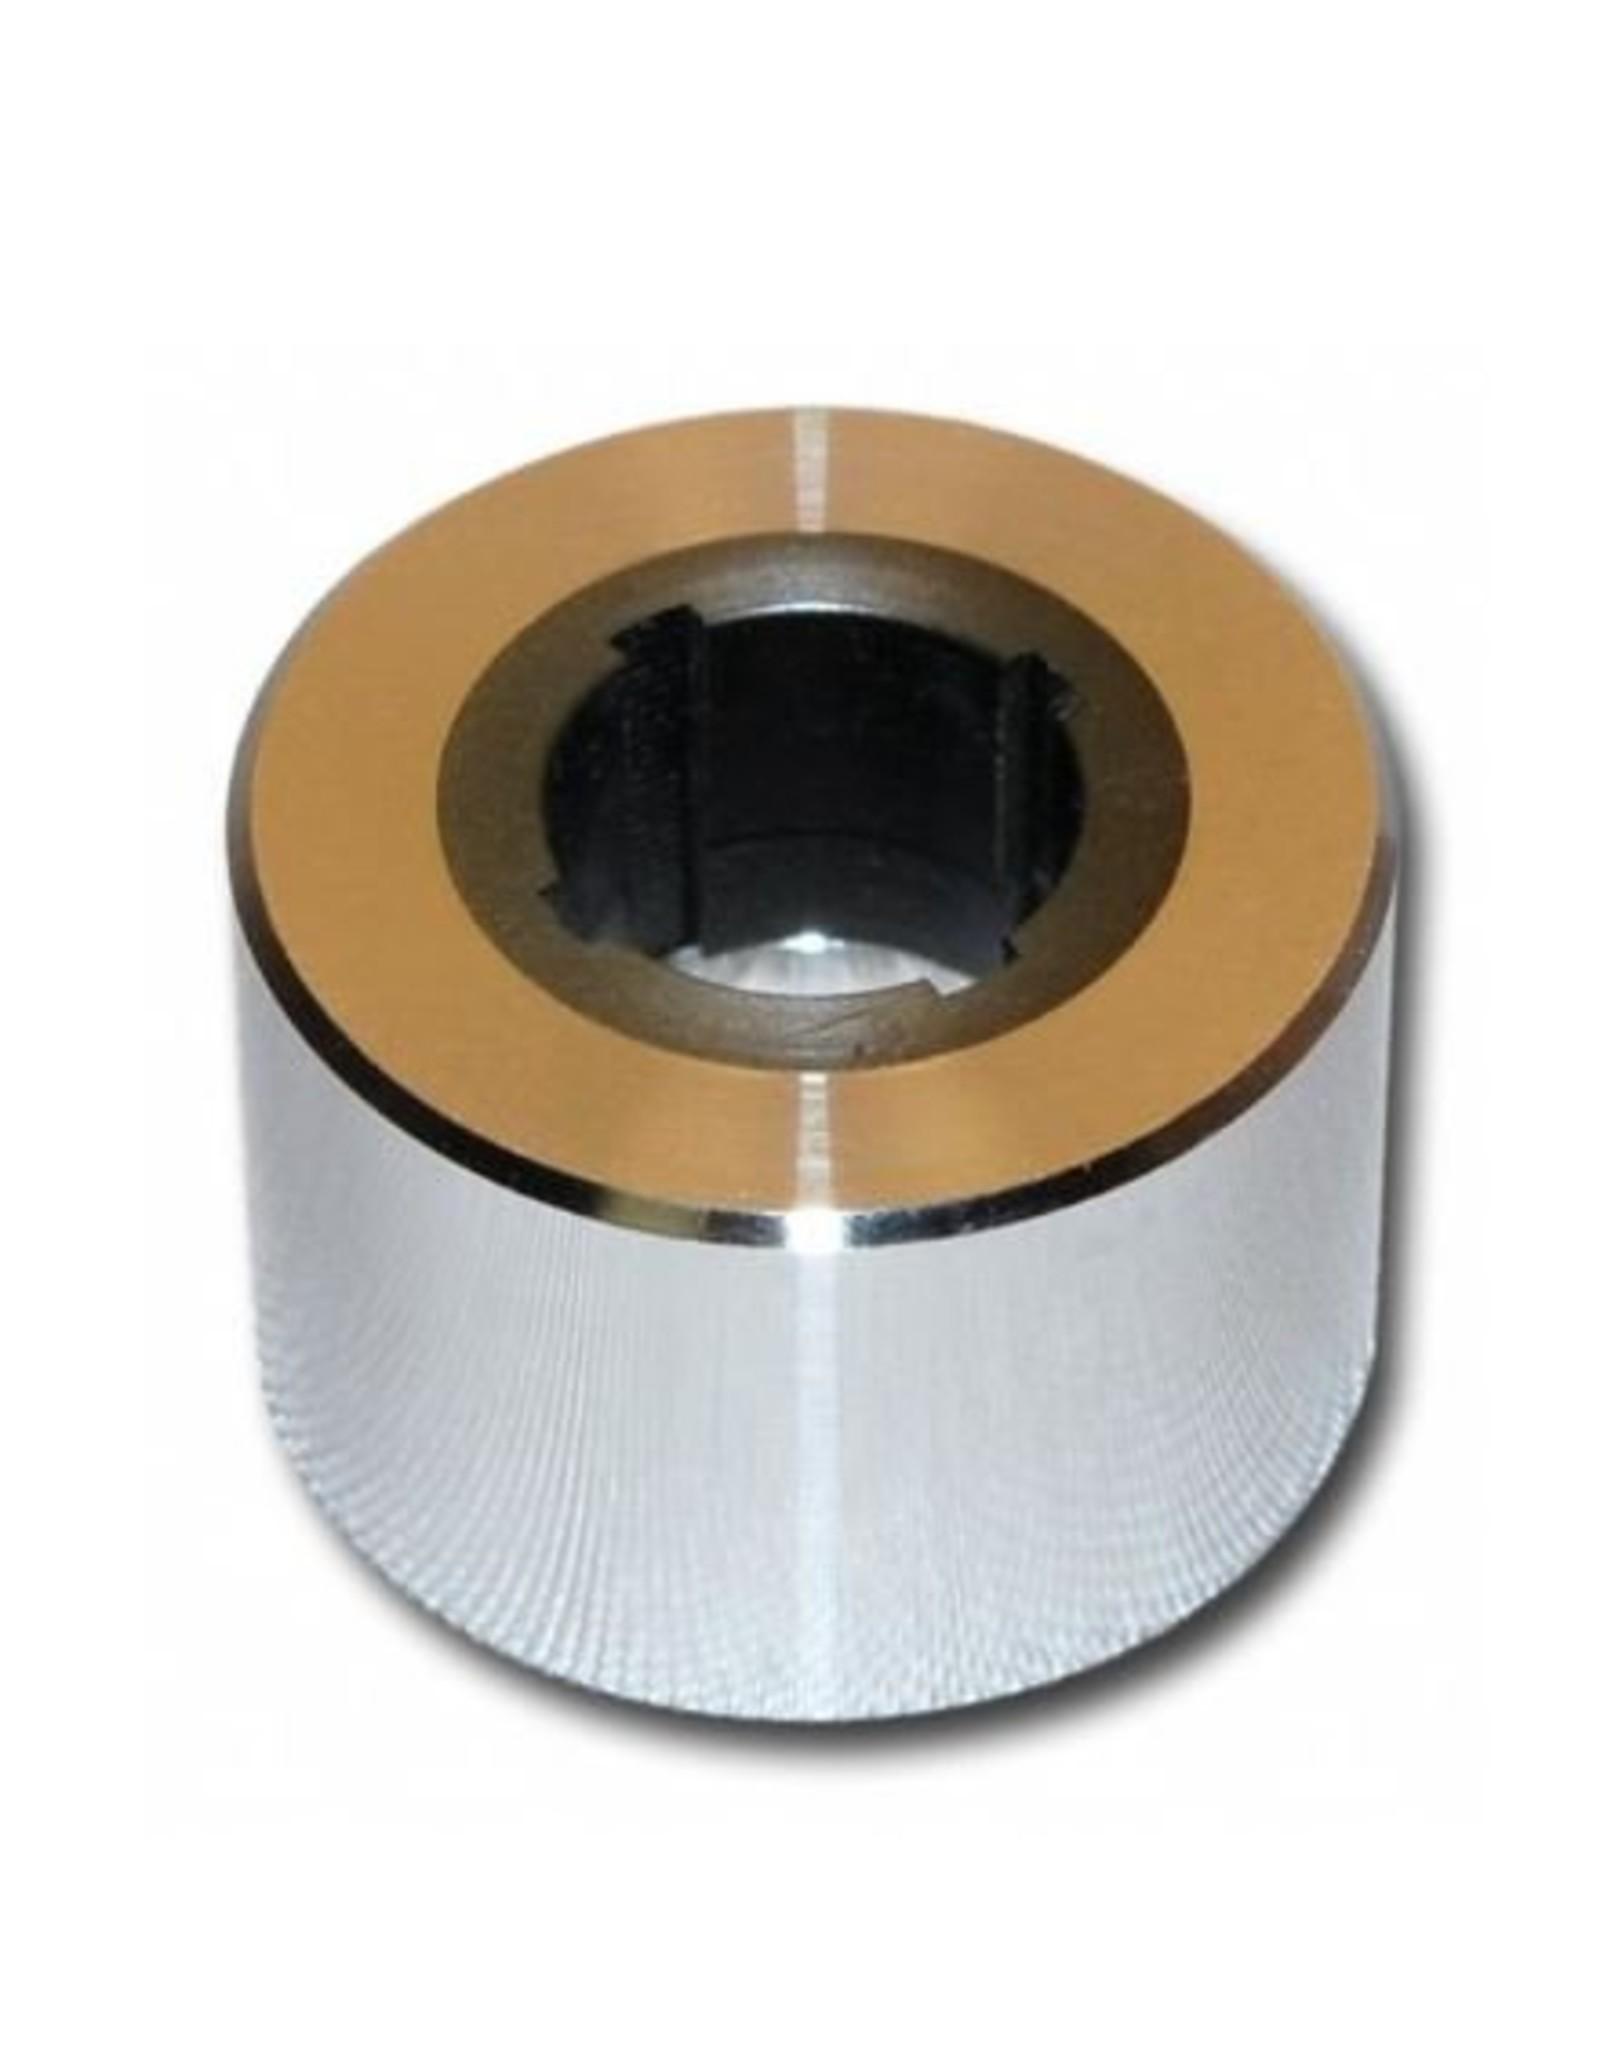 OMAX Style Backup Ring Chamfered (P2040)